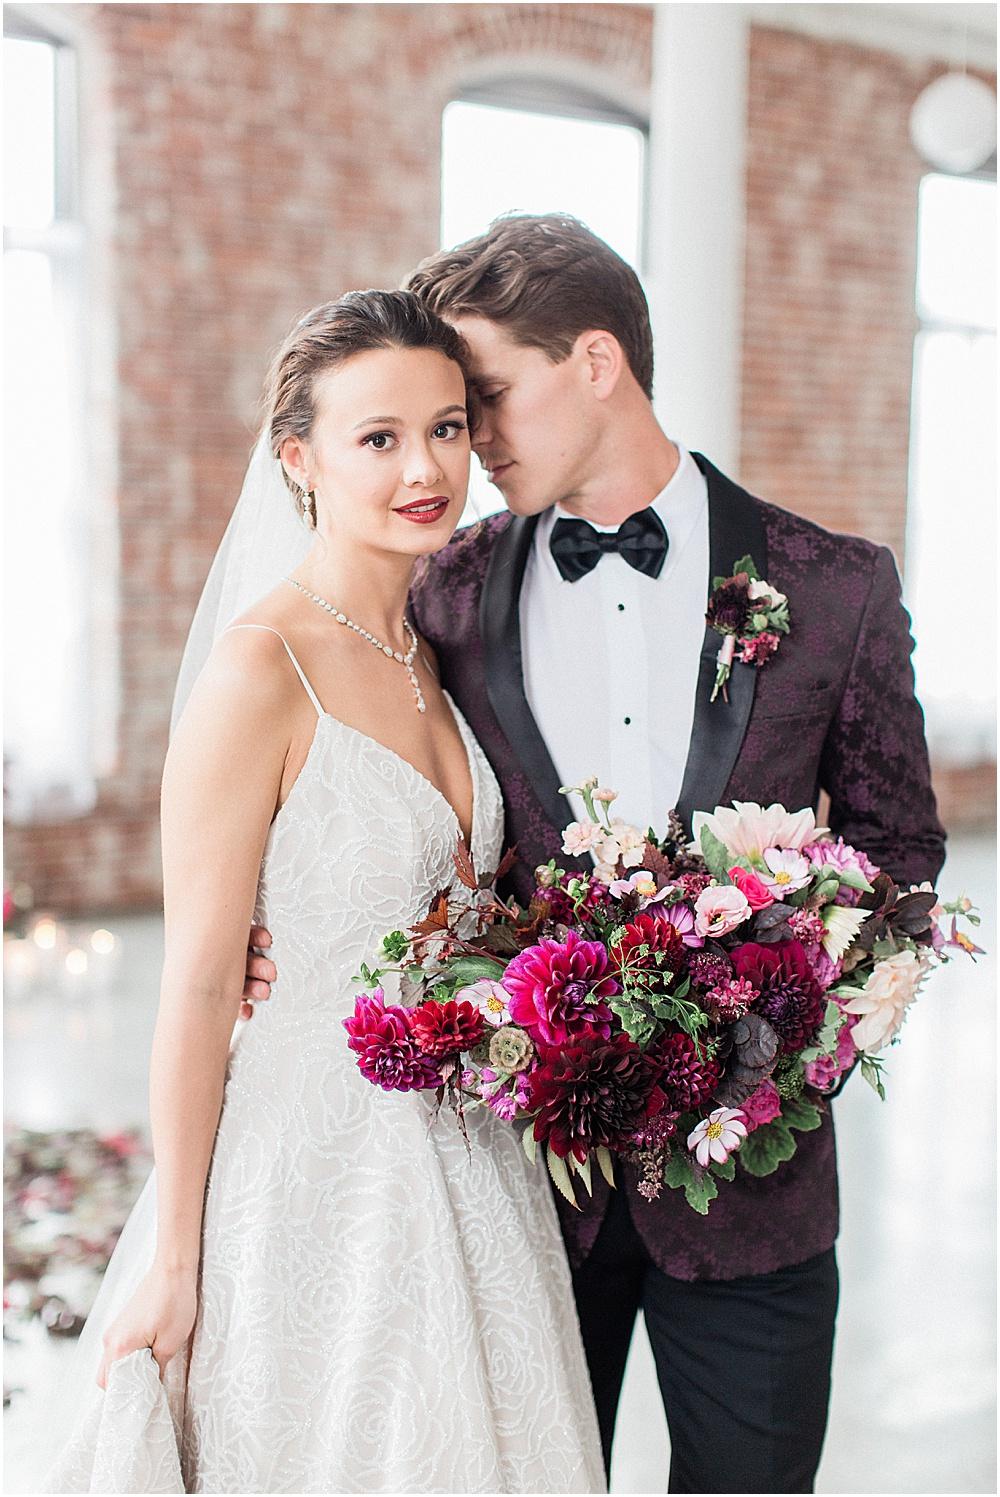 styled_shoot_fall_valentines_day_wedding_rhodi_island_ma_boston_wedding_photographyer_meredith_jane_photography_photo_0023.jpg